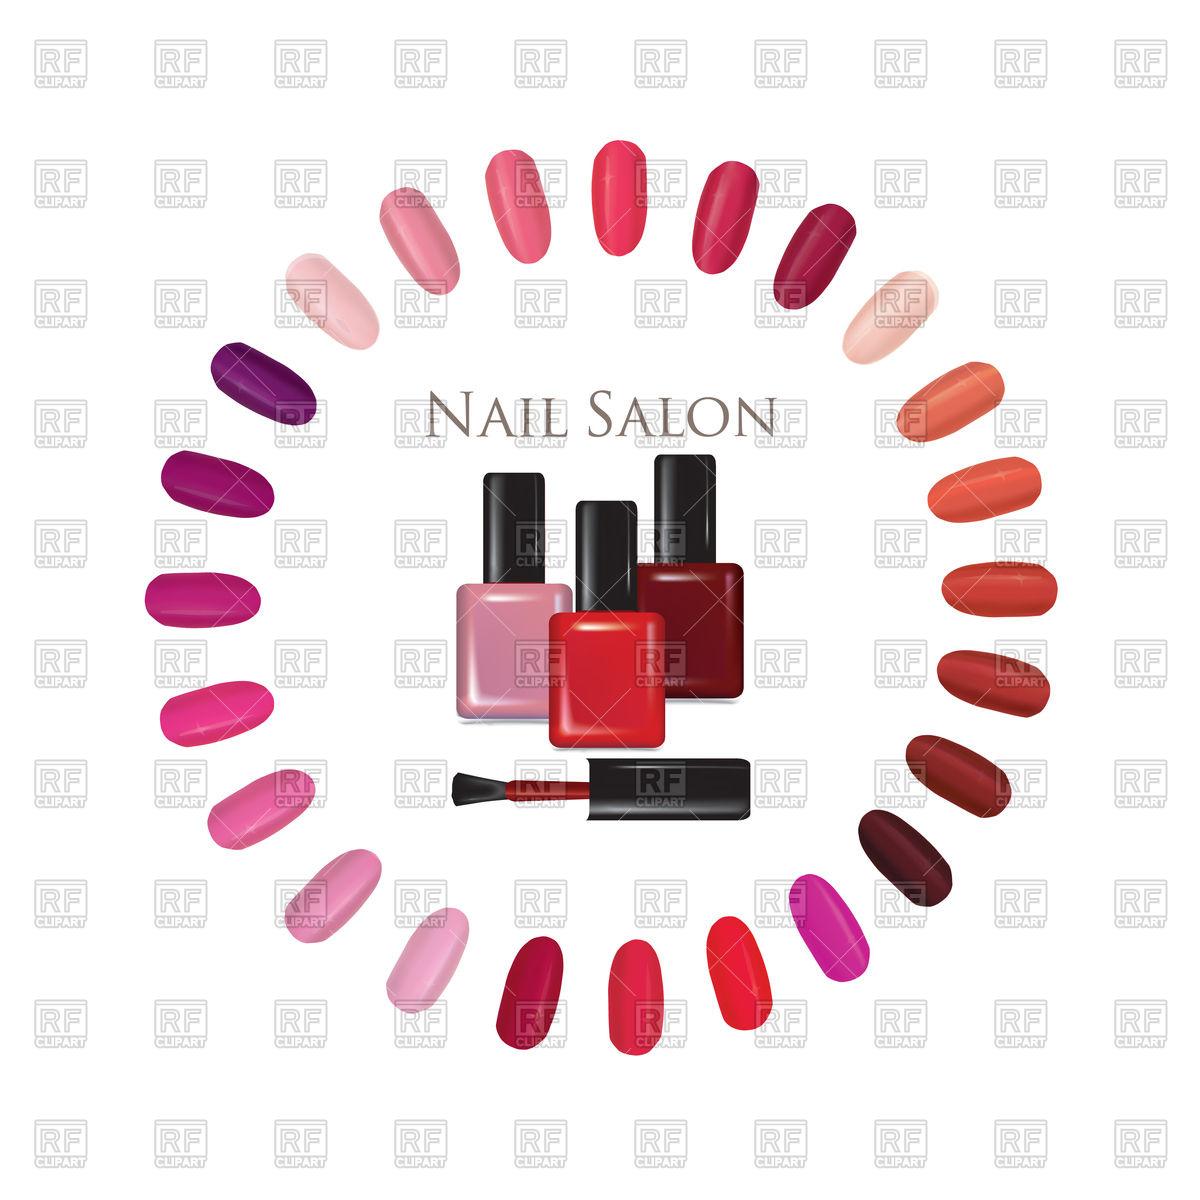 1200x1200 Nail Beauty Salon Background. Nail Palette Set. Royalty Free